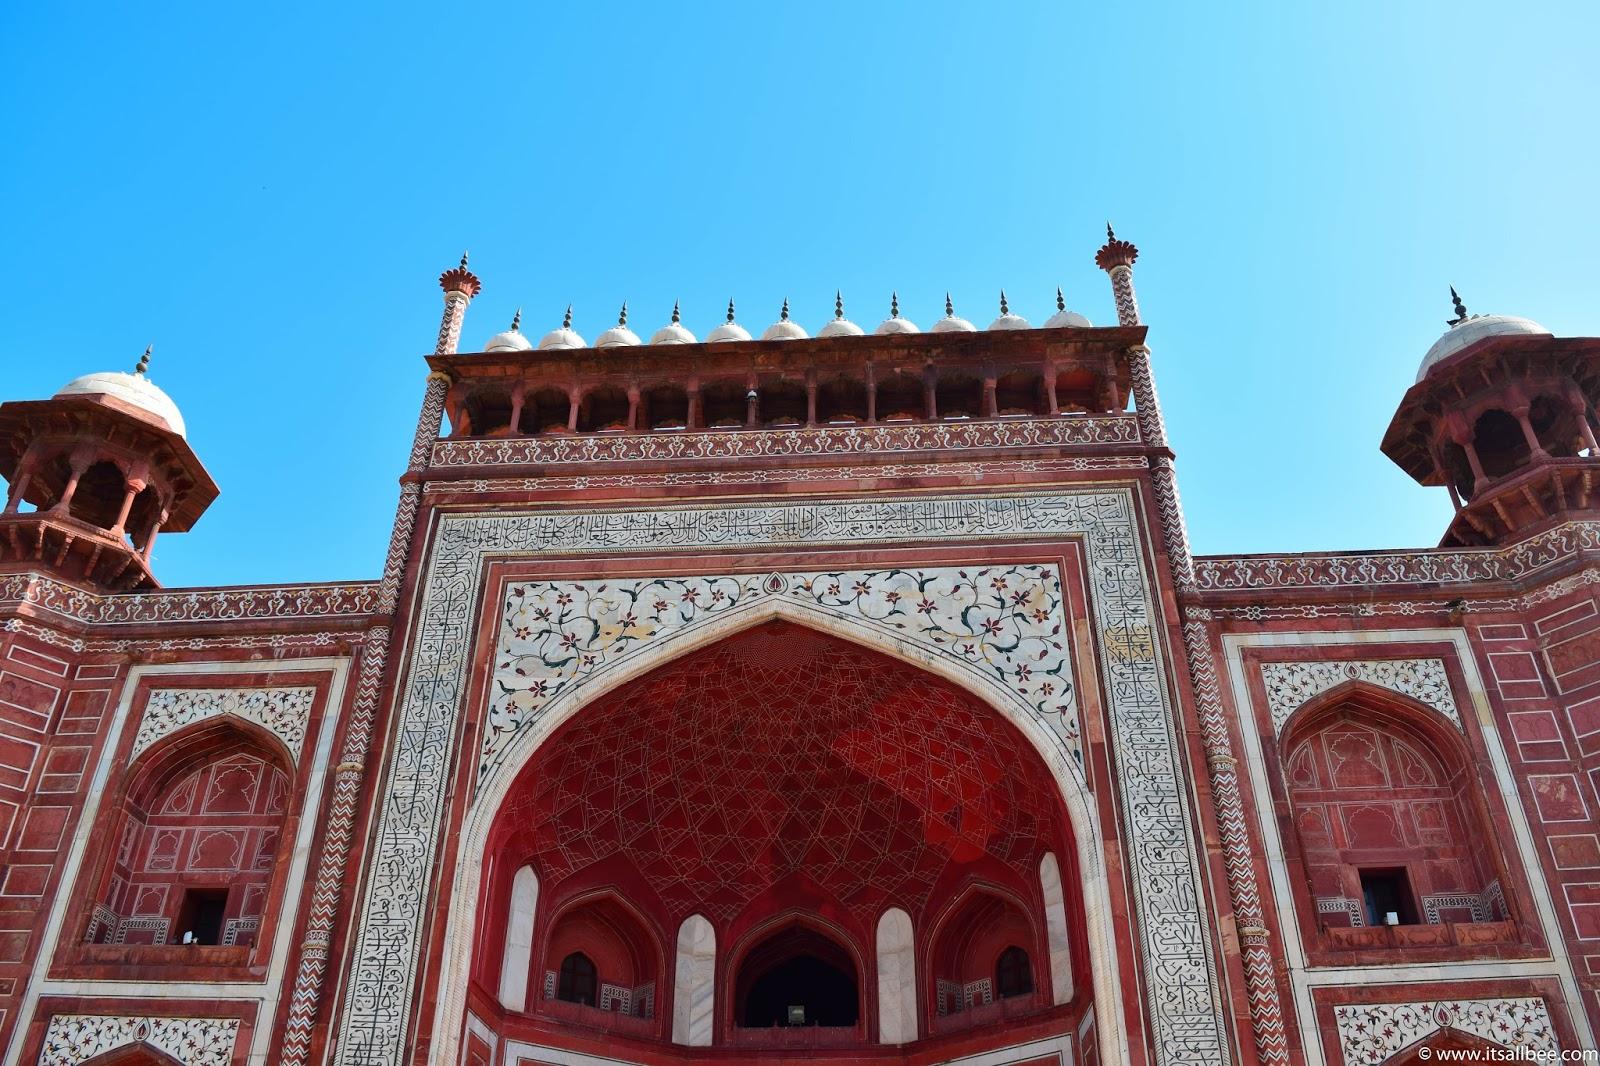 Taj Mahal - Agra - India. Photo by Bianca - www.itsallbee.com